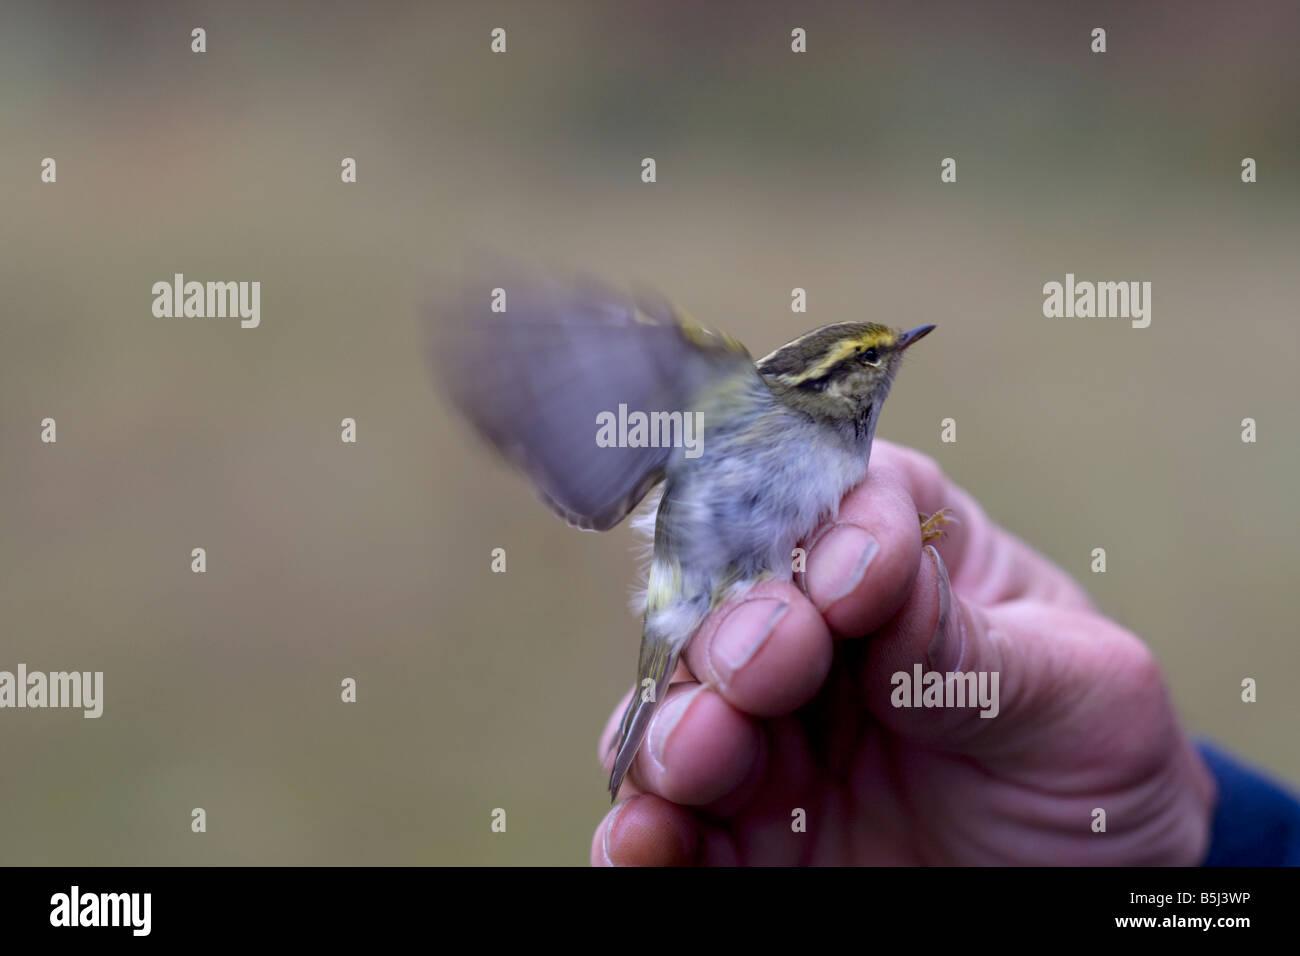 Pallas's Warbler Phylloscopus proregulus in the hand Stock Photo